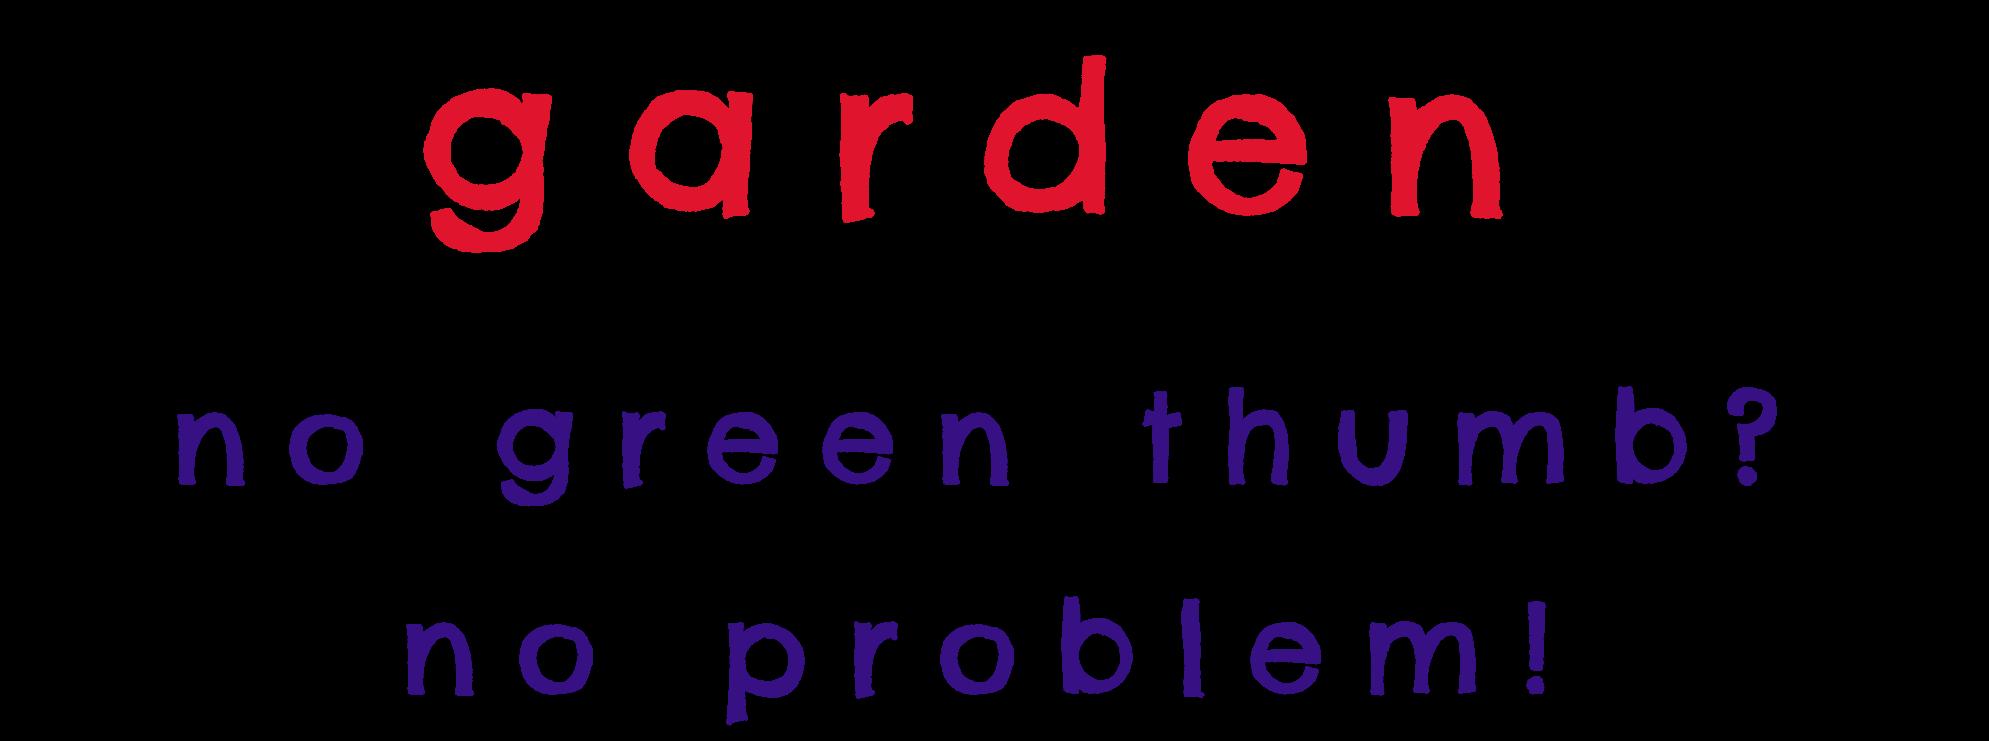 garden-title.png